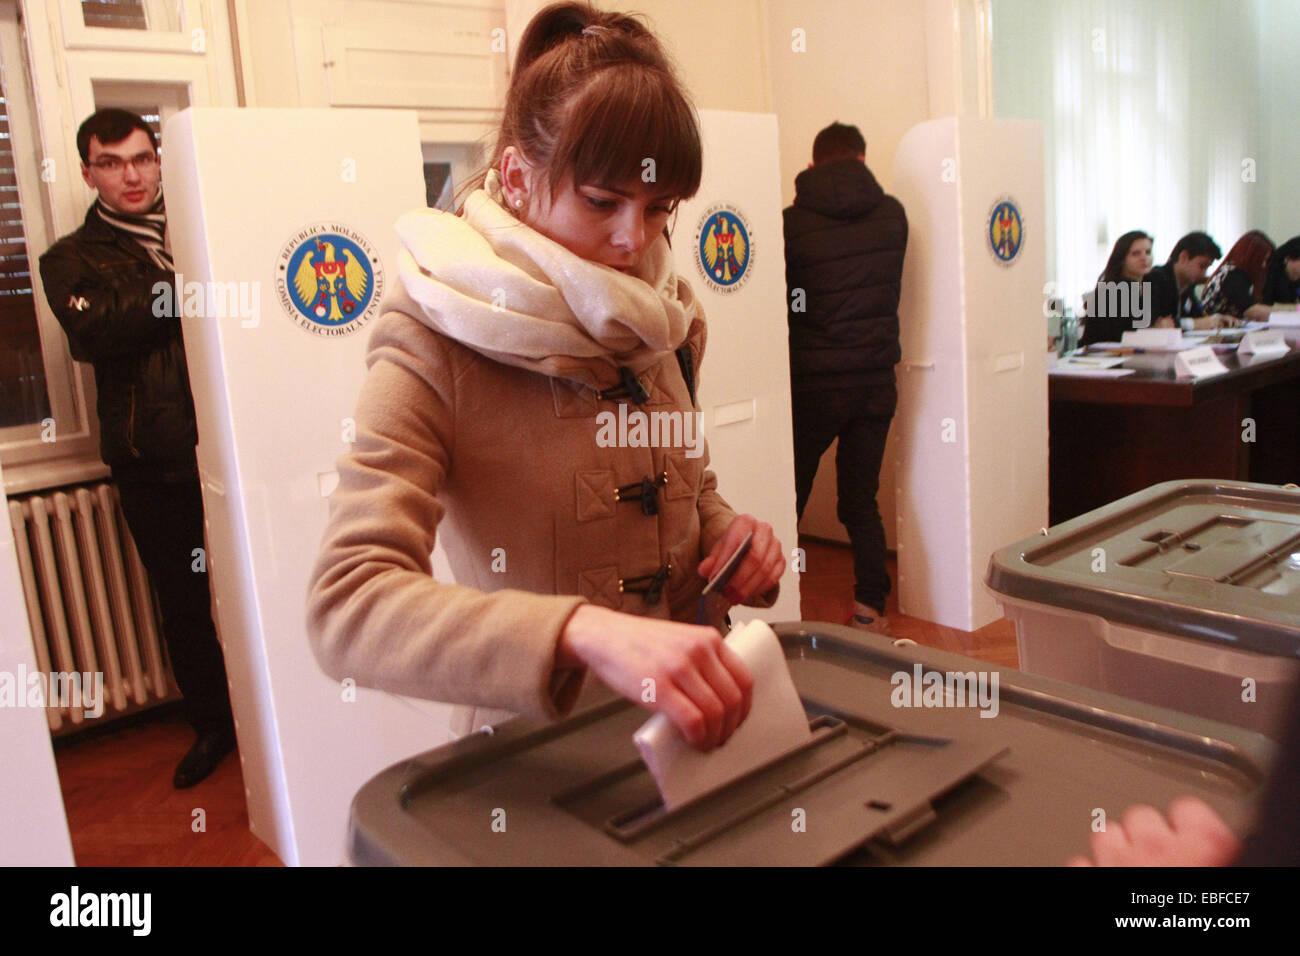 Bucharest, Romania. 30th Nov, 2014. Moldovan citizens vote at the Moldova' s Embassy in Bucharest, capital of Romania, Stock Photo